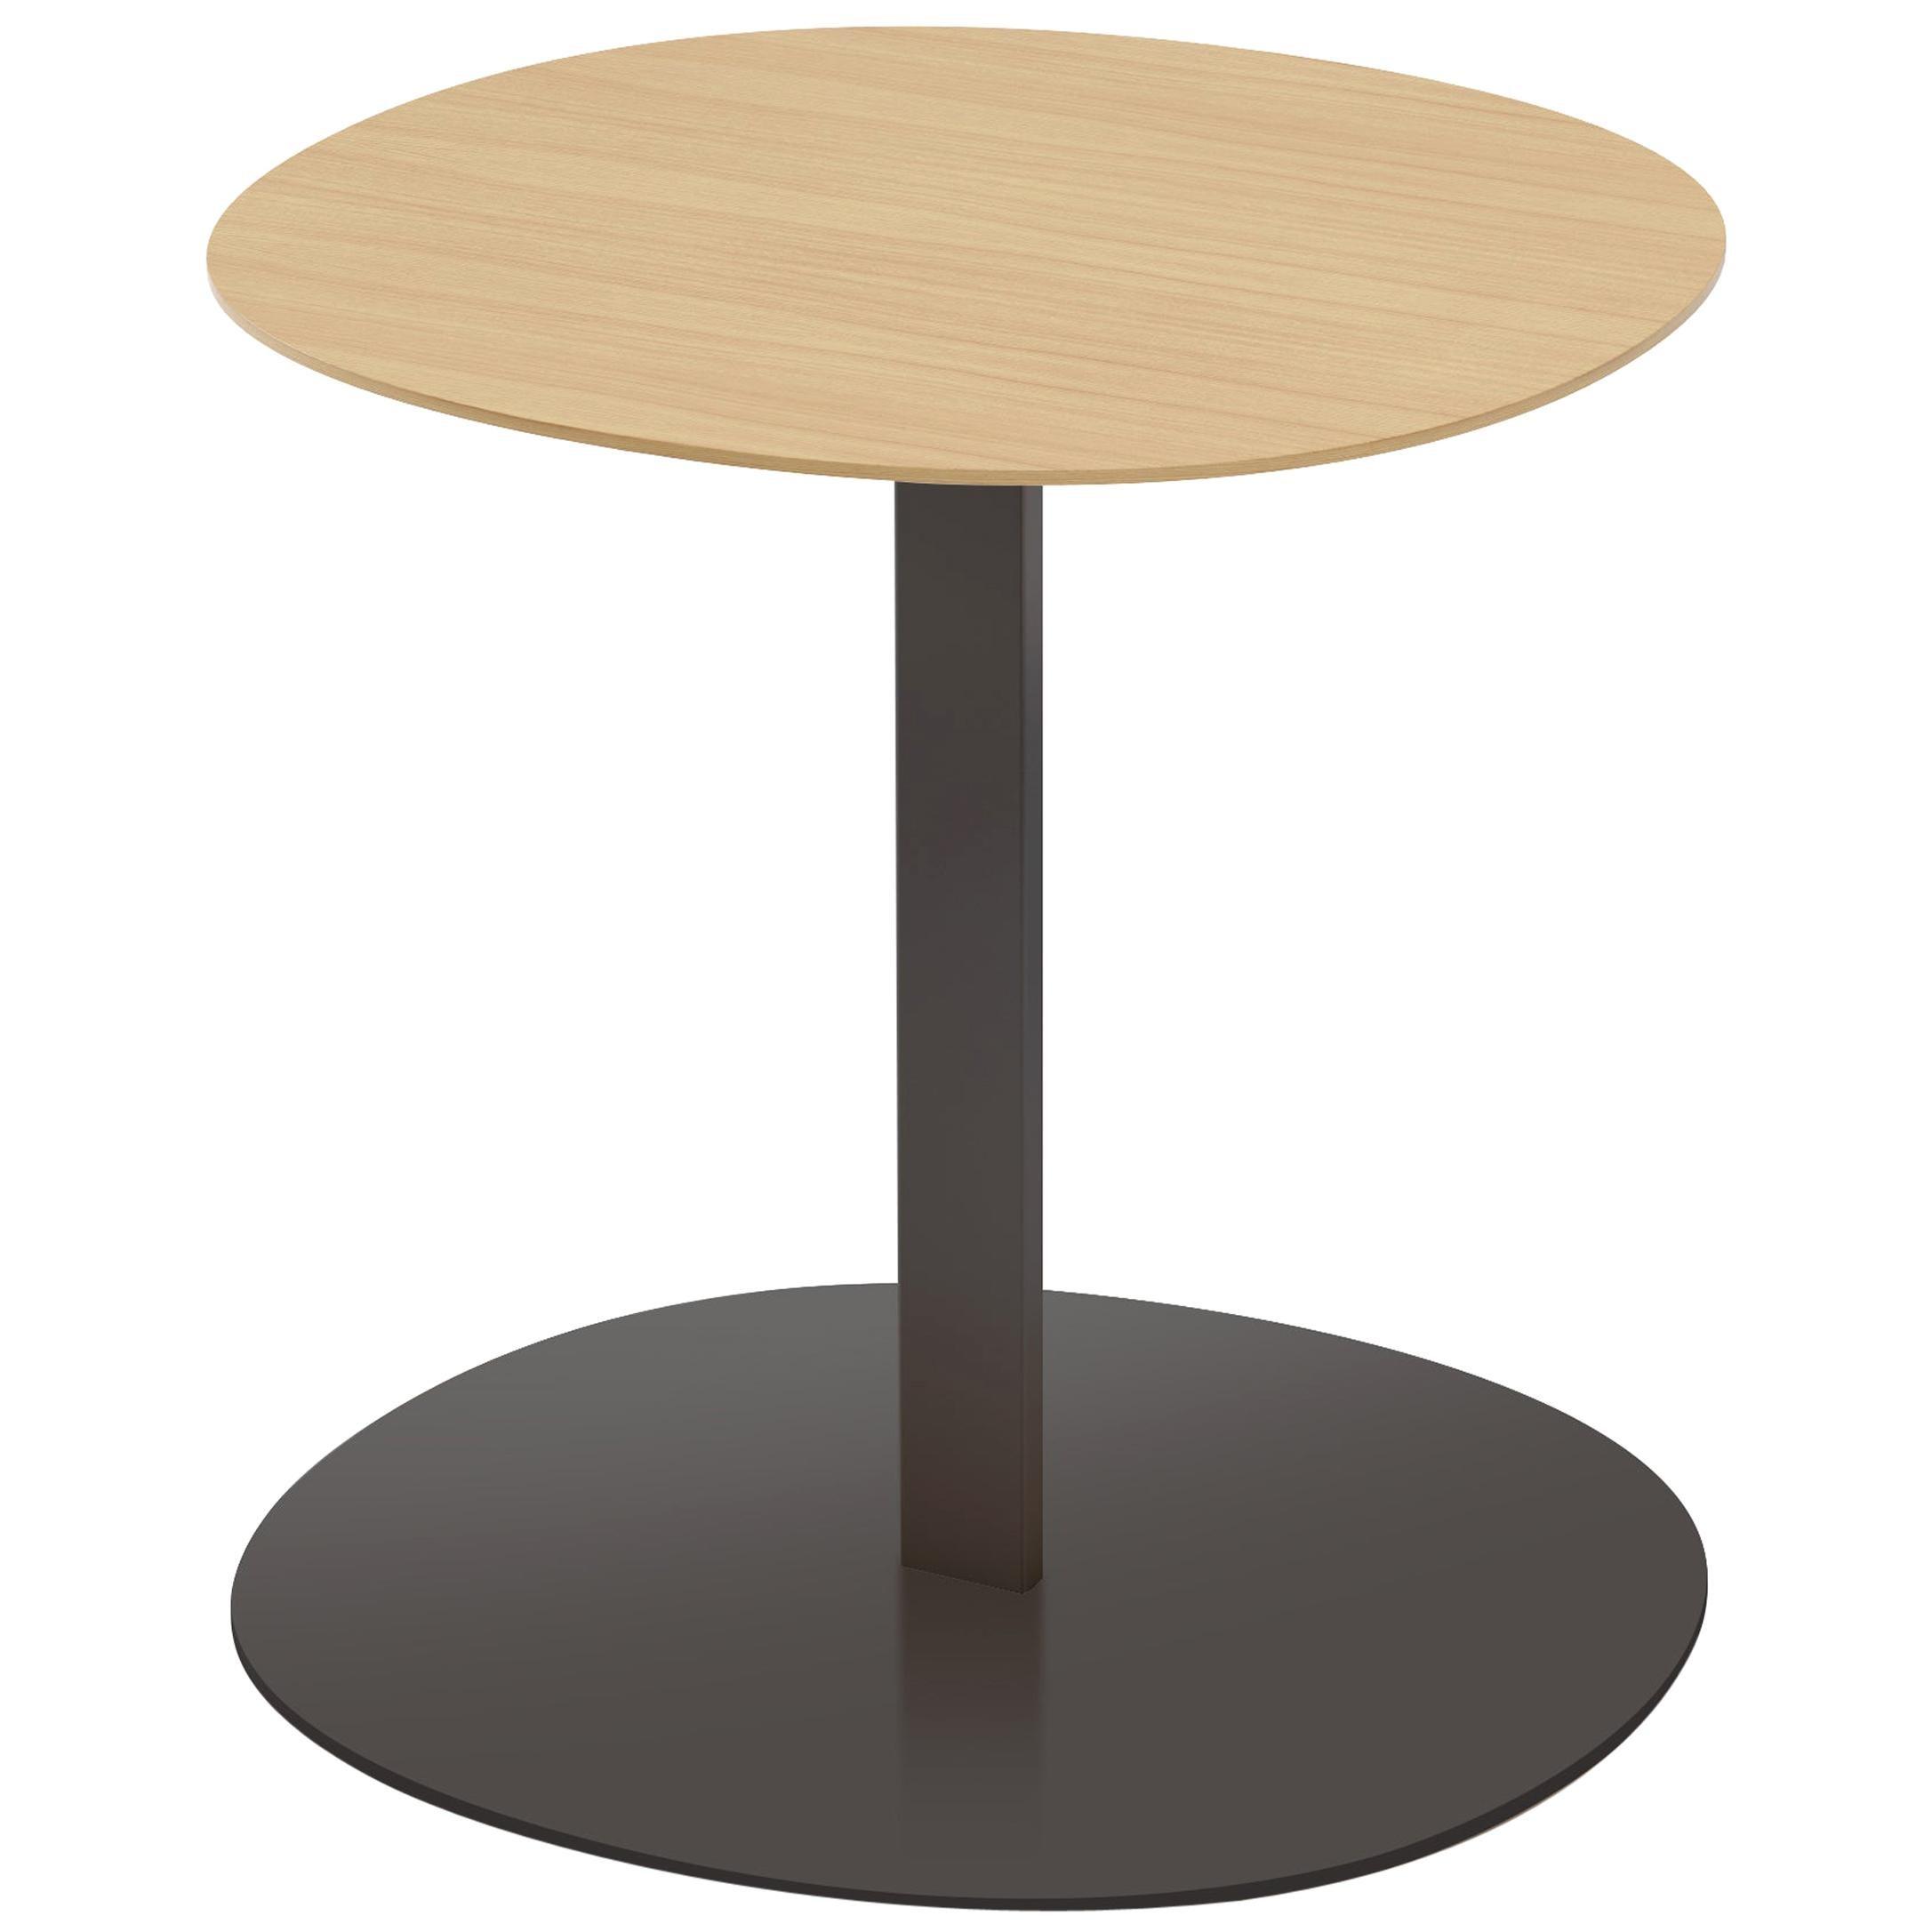 Viccarbe Serra Low Table, Matt Oak and Black Finish by Víctor Carrasco